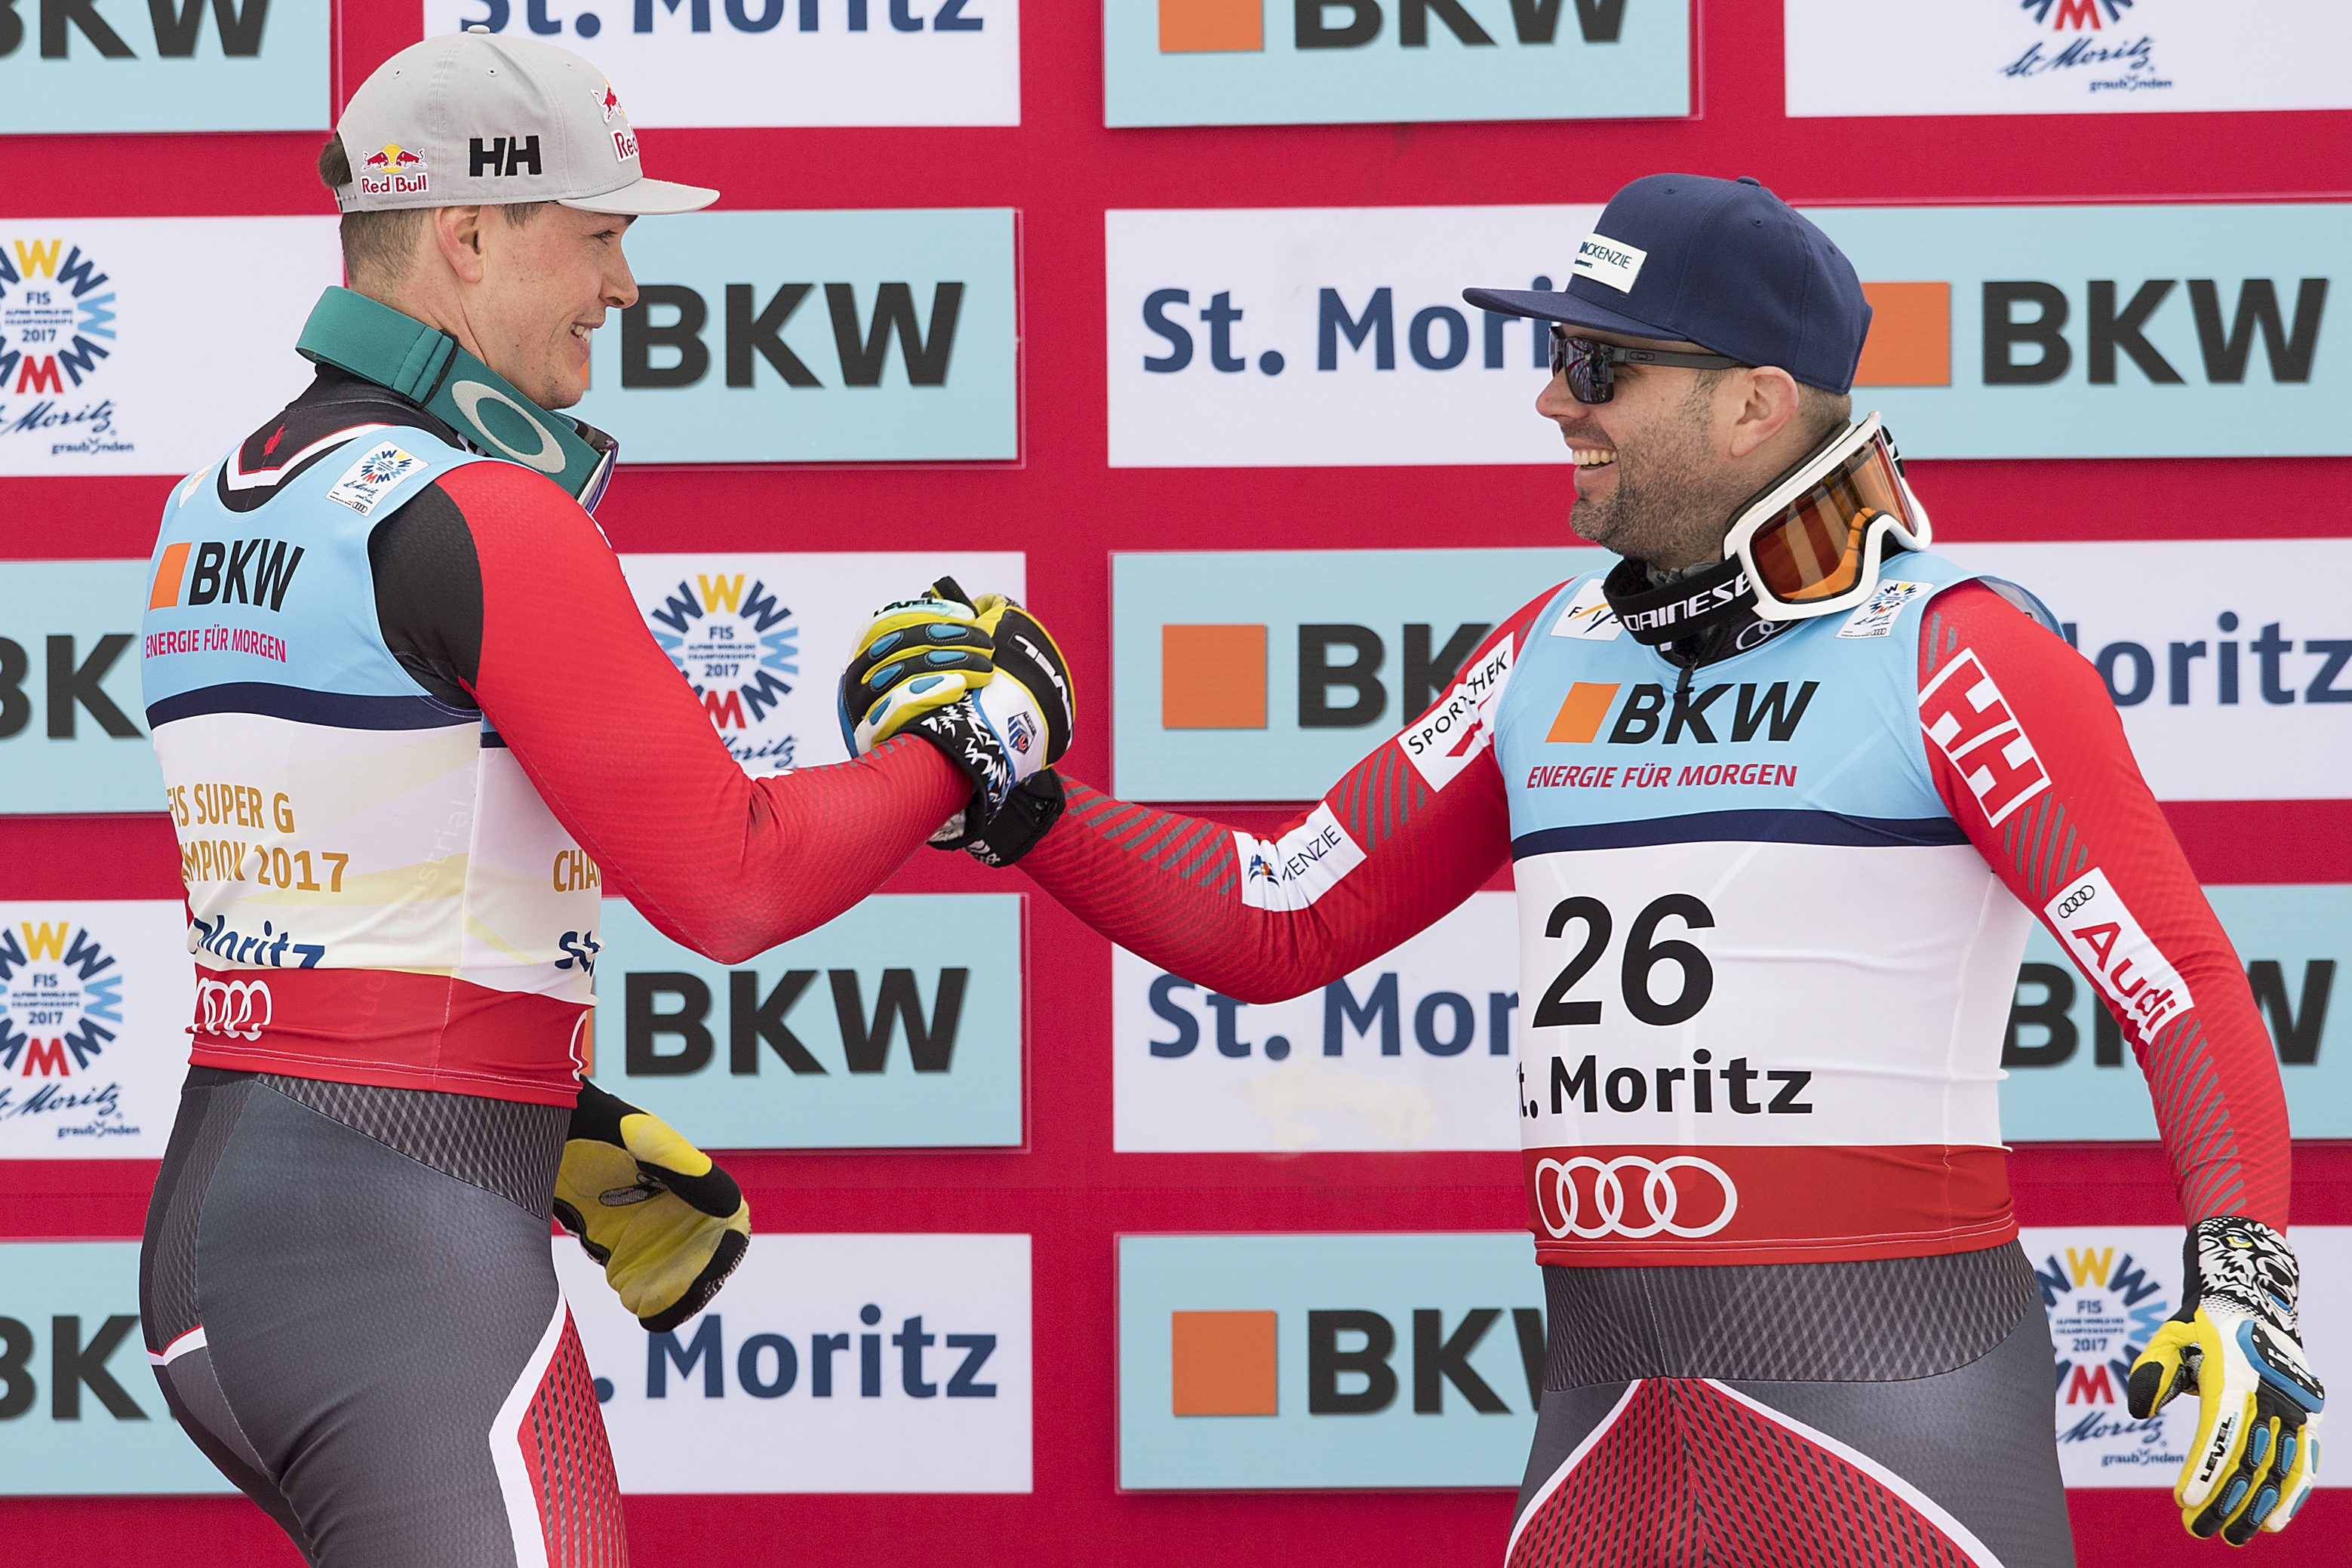 Gold medalist Erik Guay of Canada, left, and bronze medalist Manuel Osborne-Paradis of Canada, right, shake hands during the men's Super-G flower ceremony at the 2017 Alpine Skiing World Championships in St. Moritz, Switzerland, Wednesday, Feb. 8, 2017. (Peter Schneider/Keystone via AP)